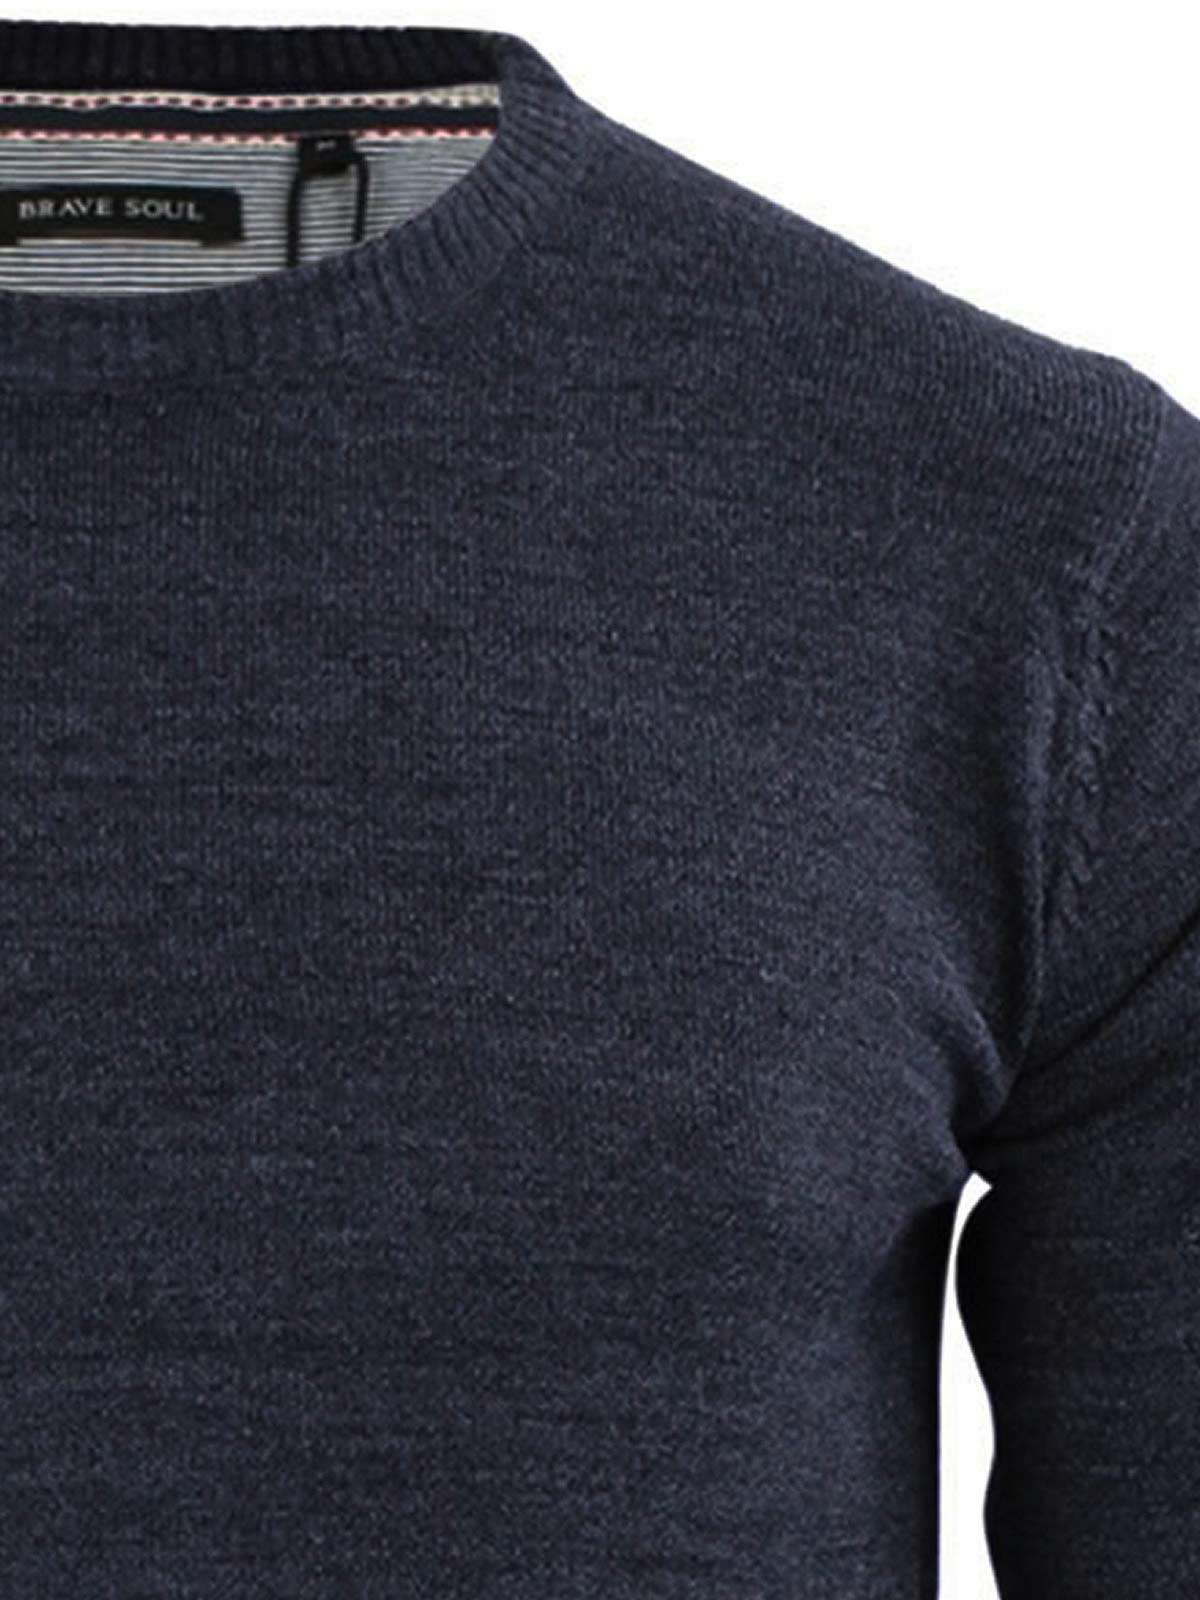 Mens-Jumper-Brave-Soul-Urbain-Knitted-Crew-Neck-Sweater thumbnail 34